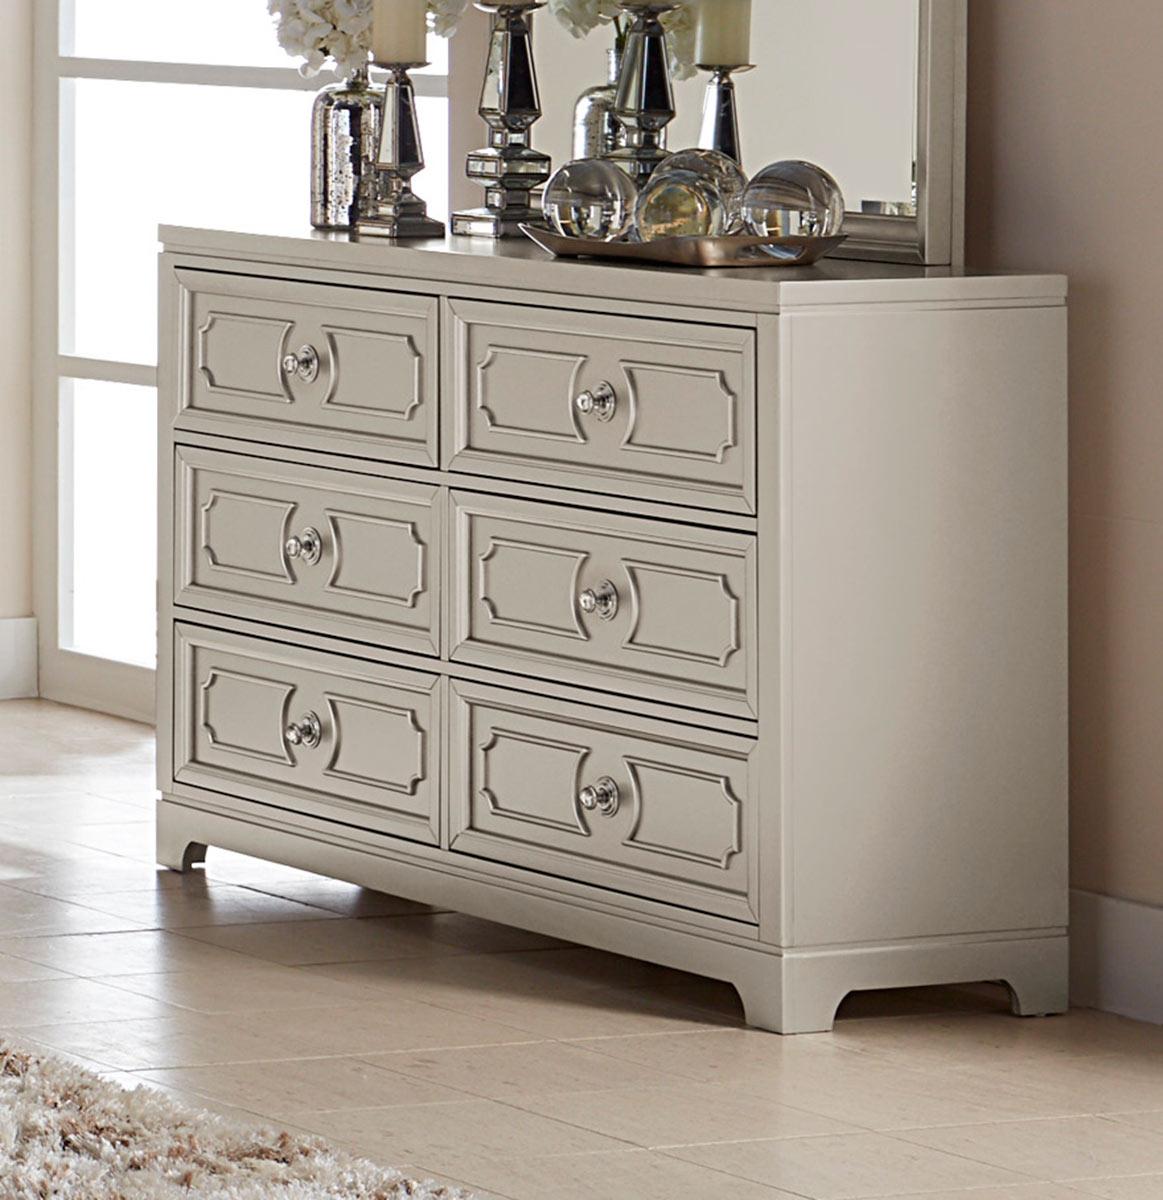 Homelegance Libretto Dresser - Silver